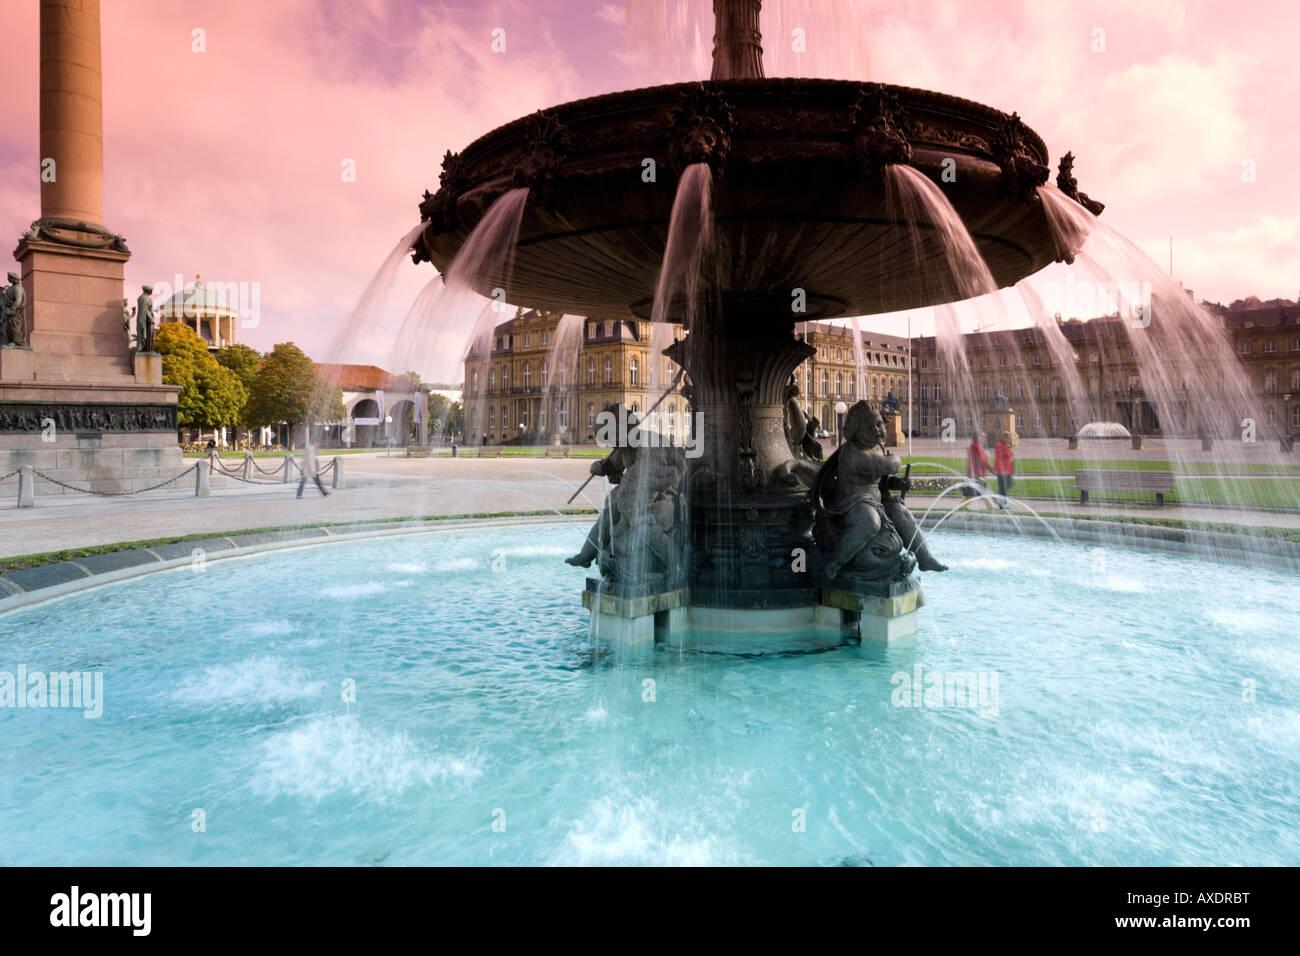 Deutschland, Stuttgart, Brunnen am Schlossplatz Stockbild